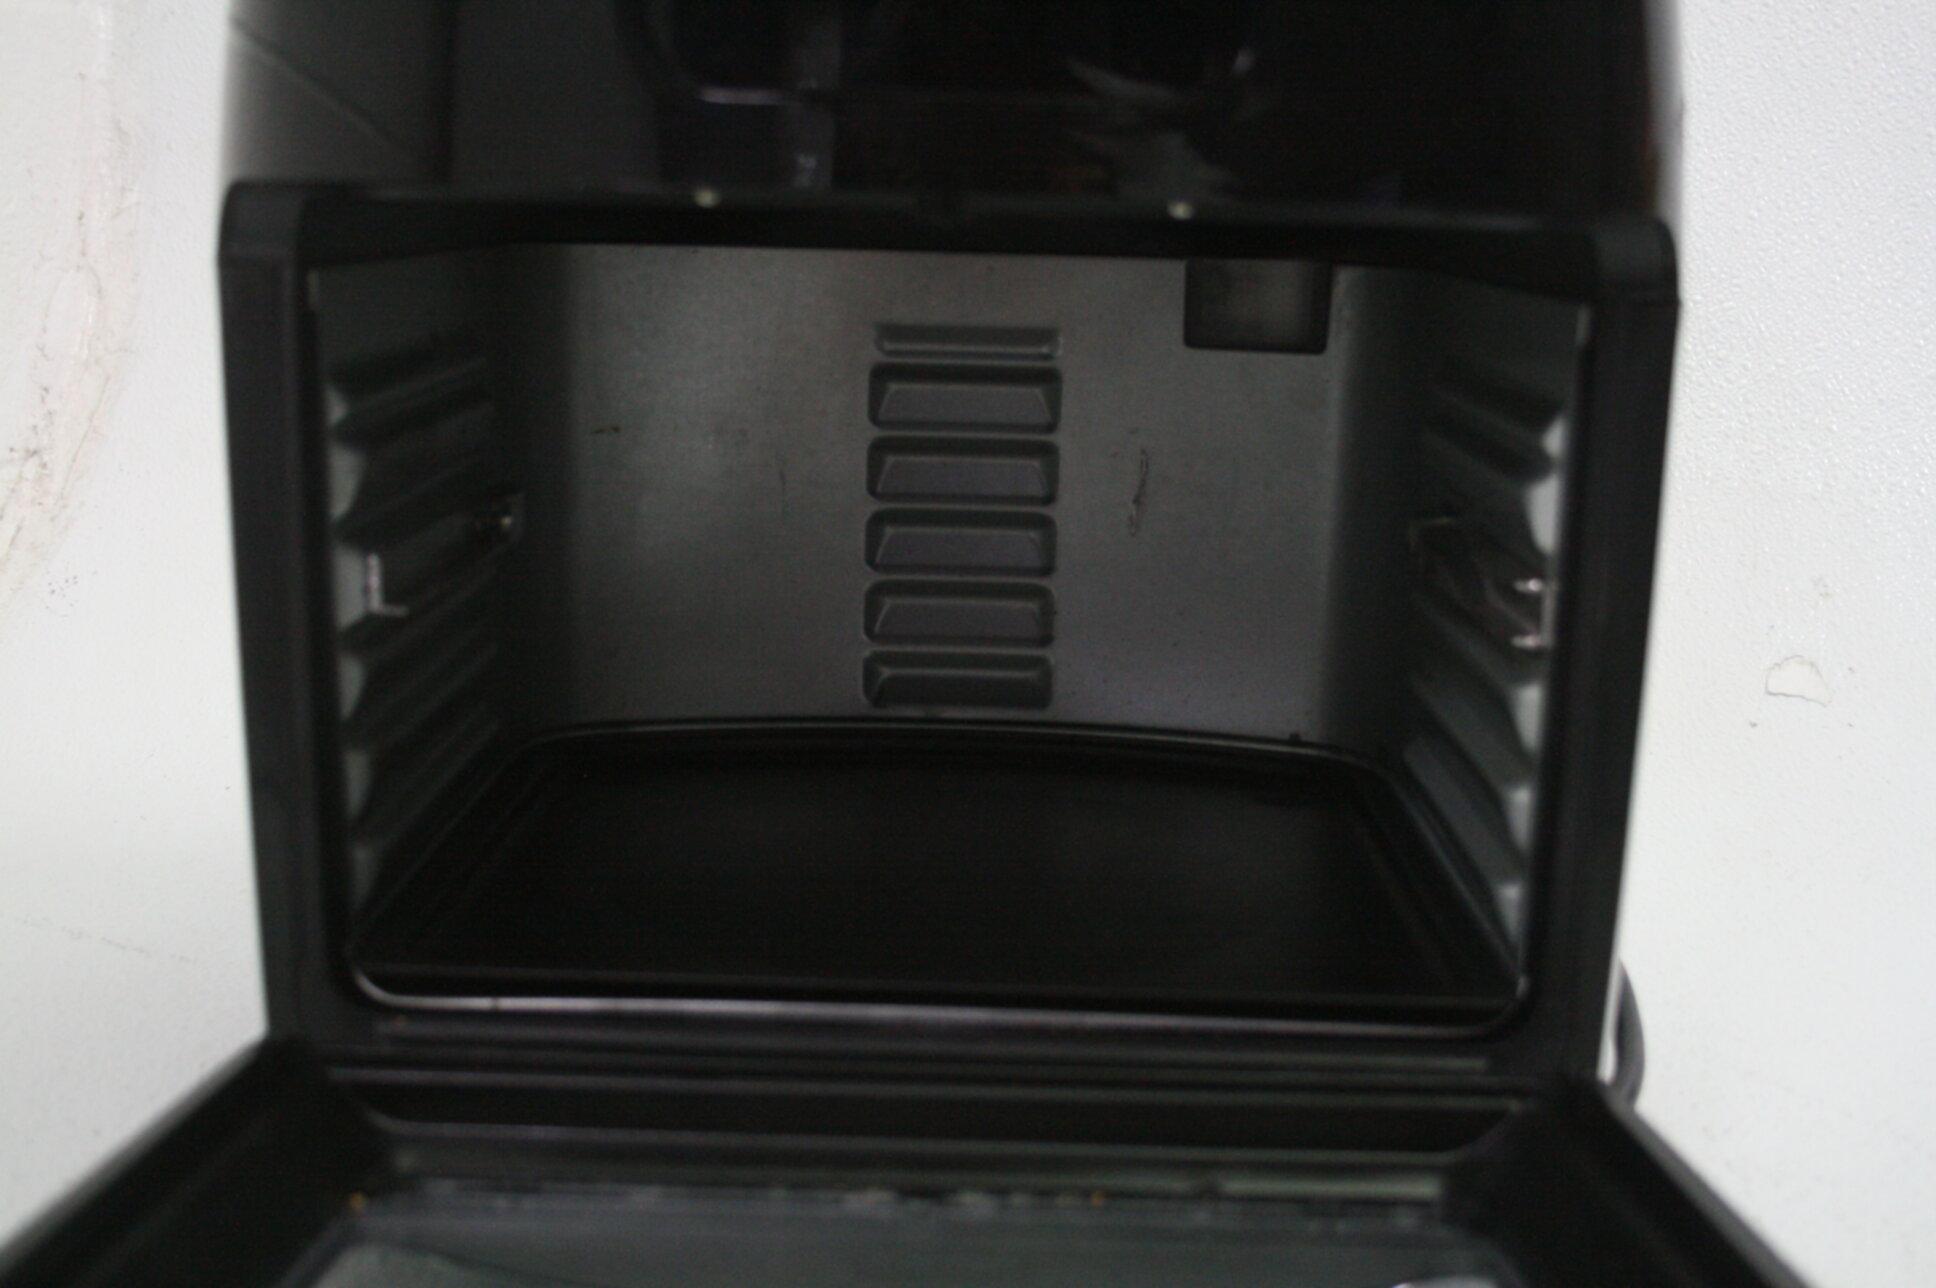 Chefman 6.3 Quart Digital Air Fryer Roast Rotisserie Oven ...